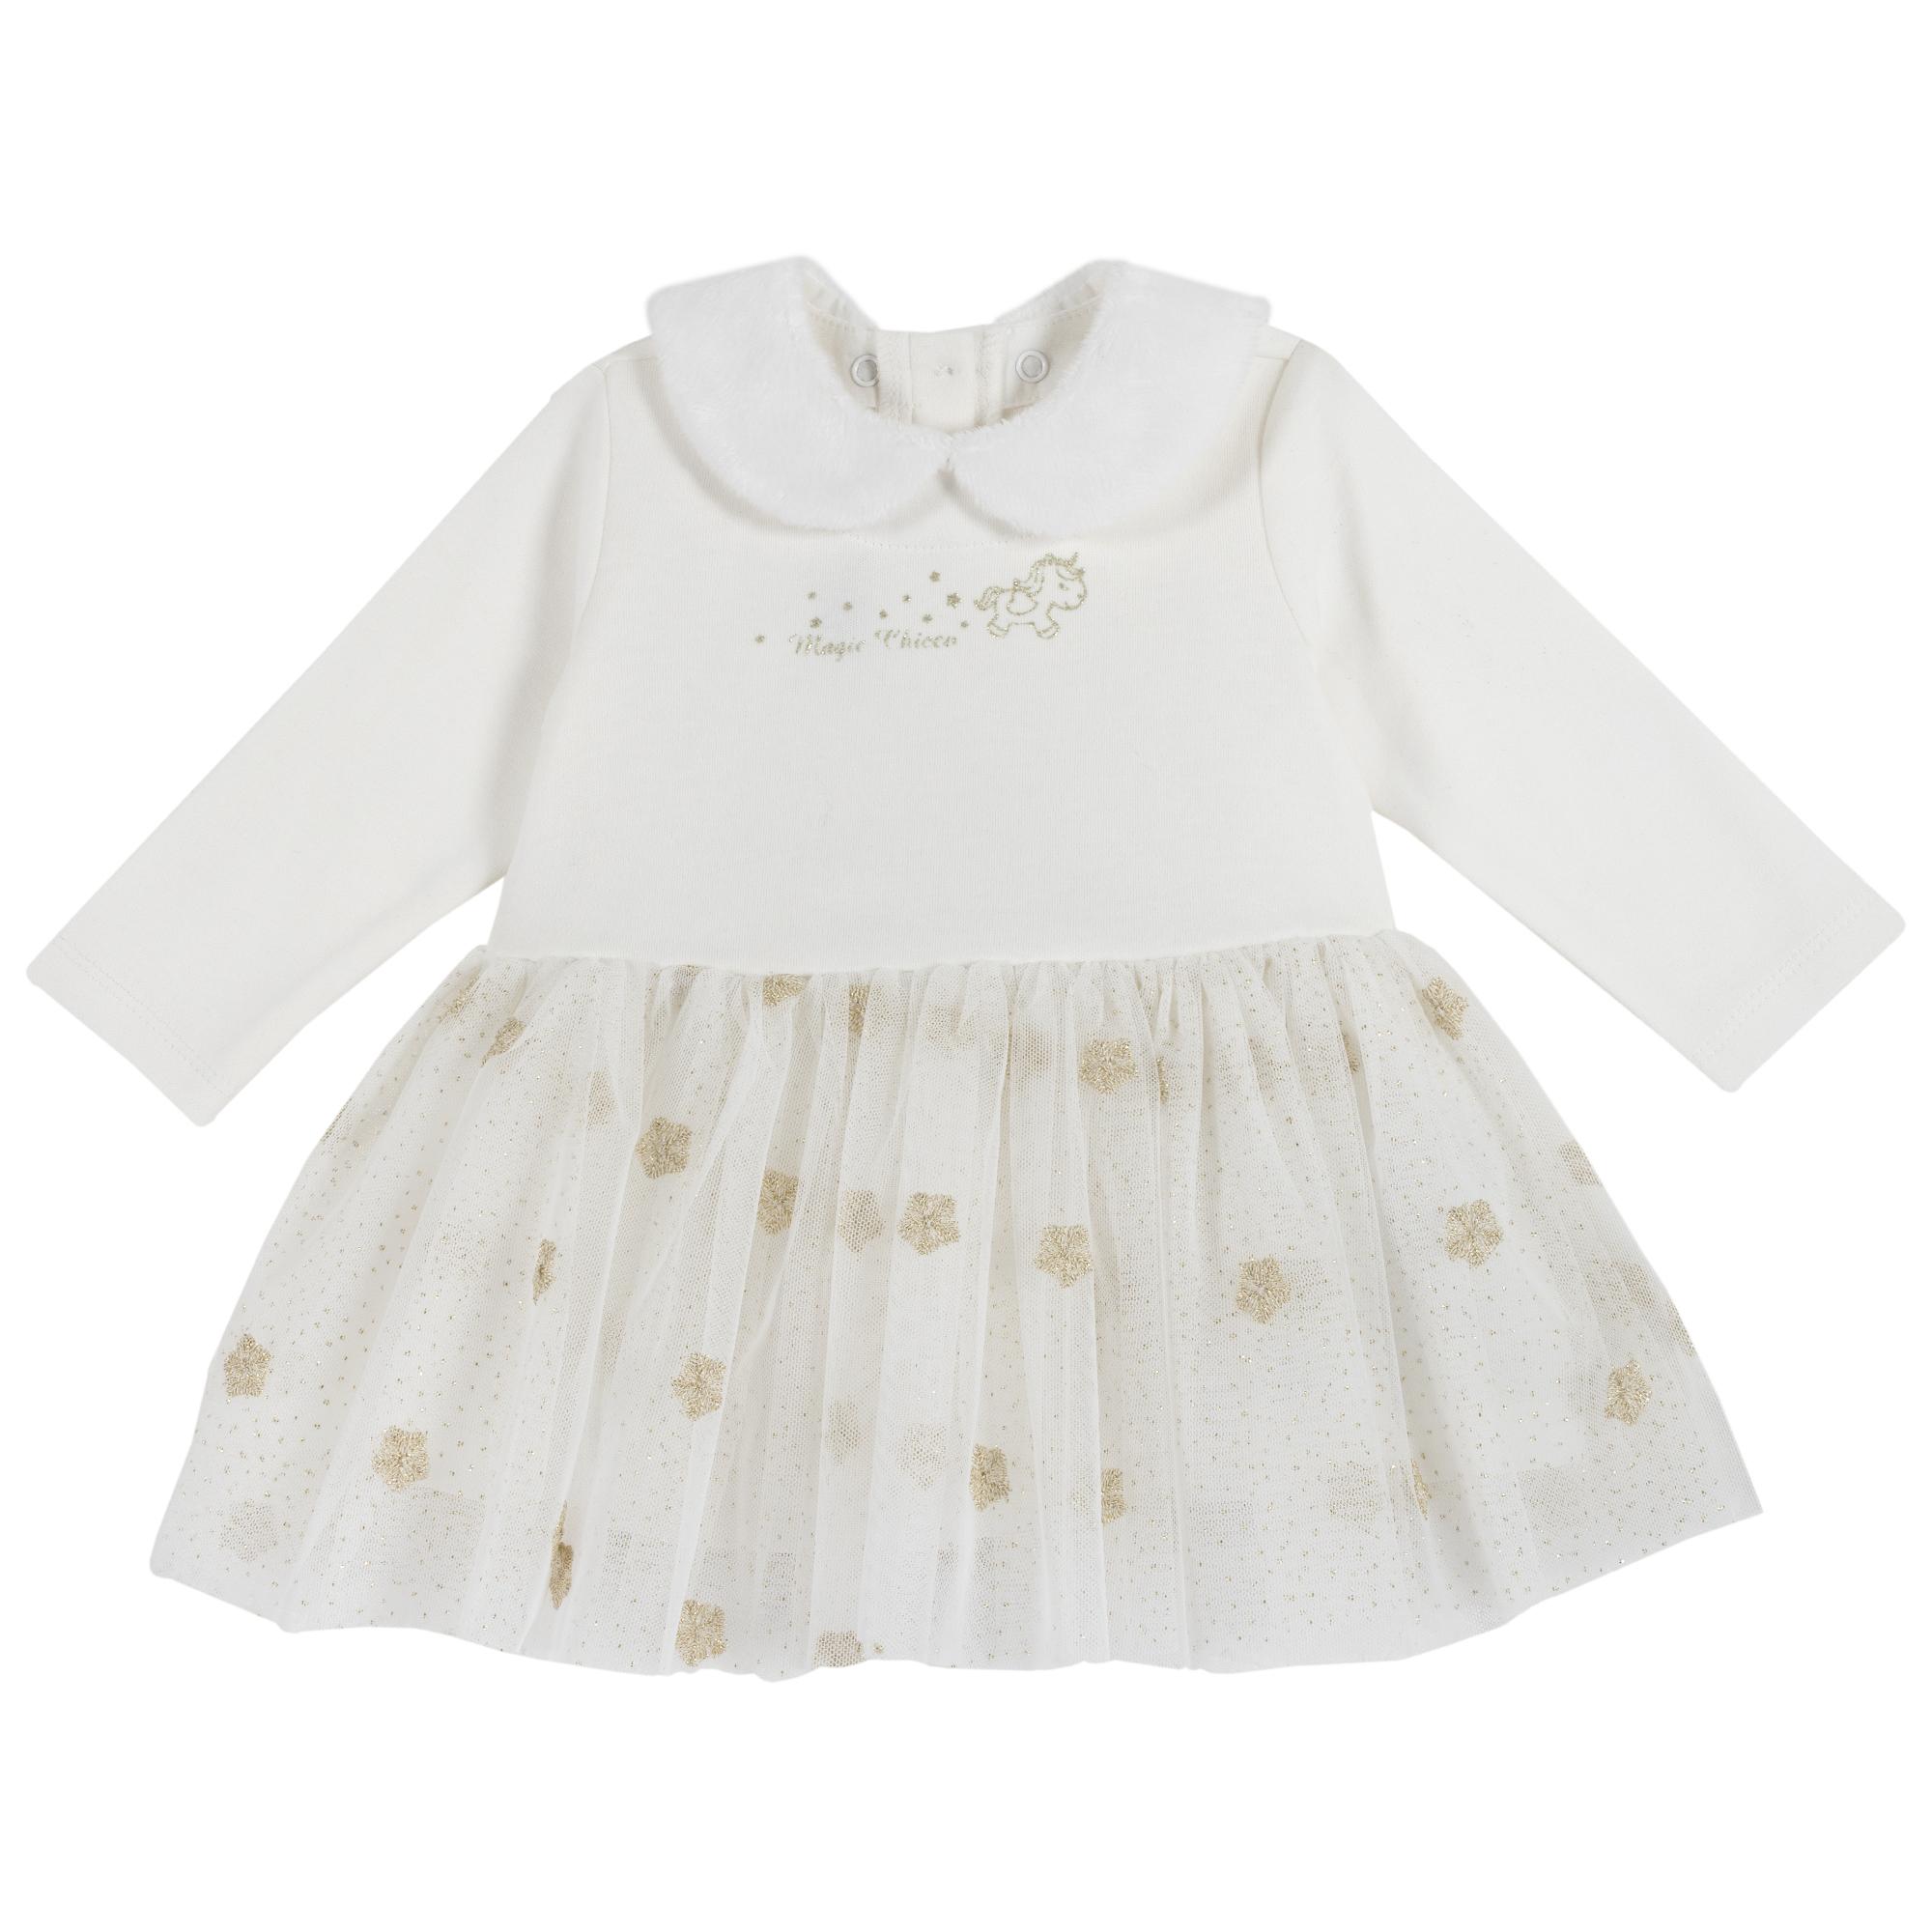 Rochie copii Chicco, maneca lunga, alb, 03531 din categoria Rochii, Fuste